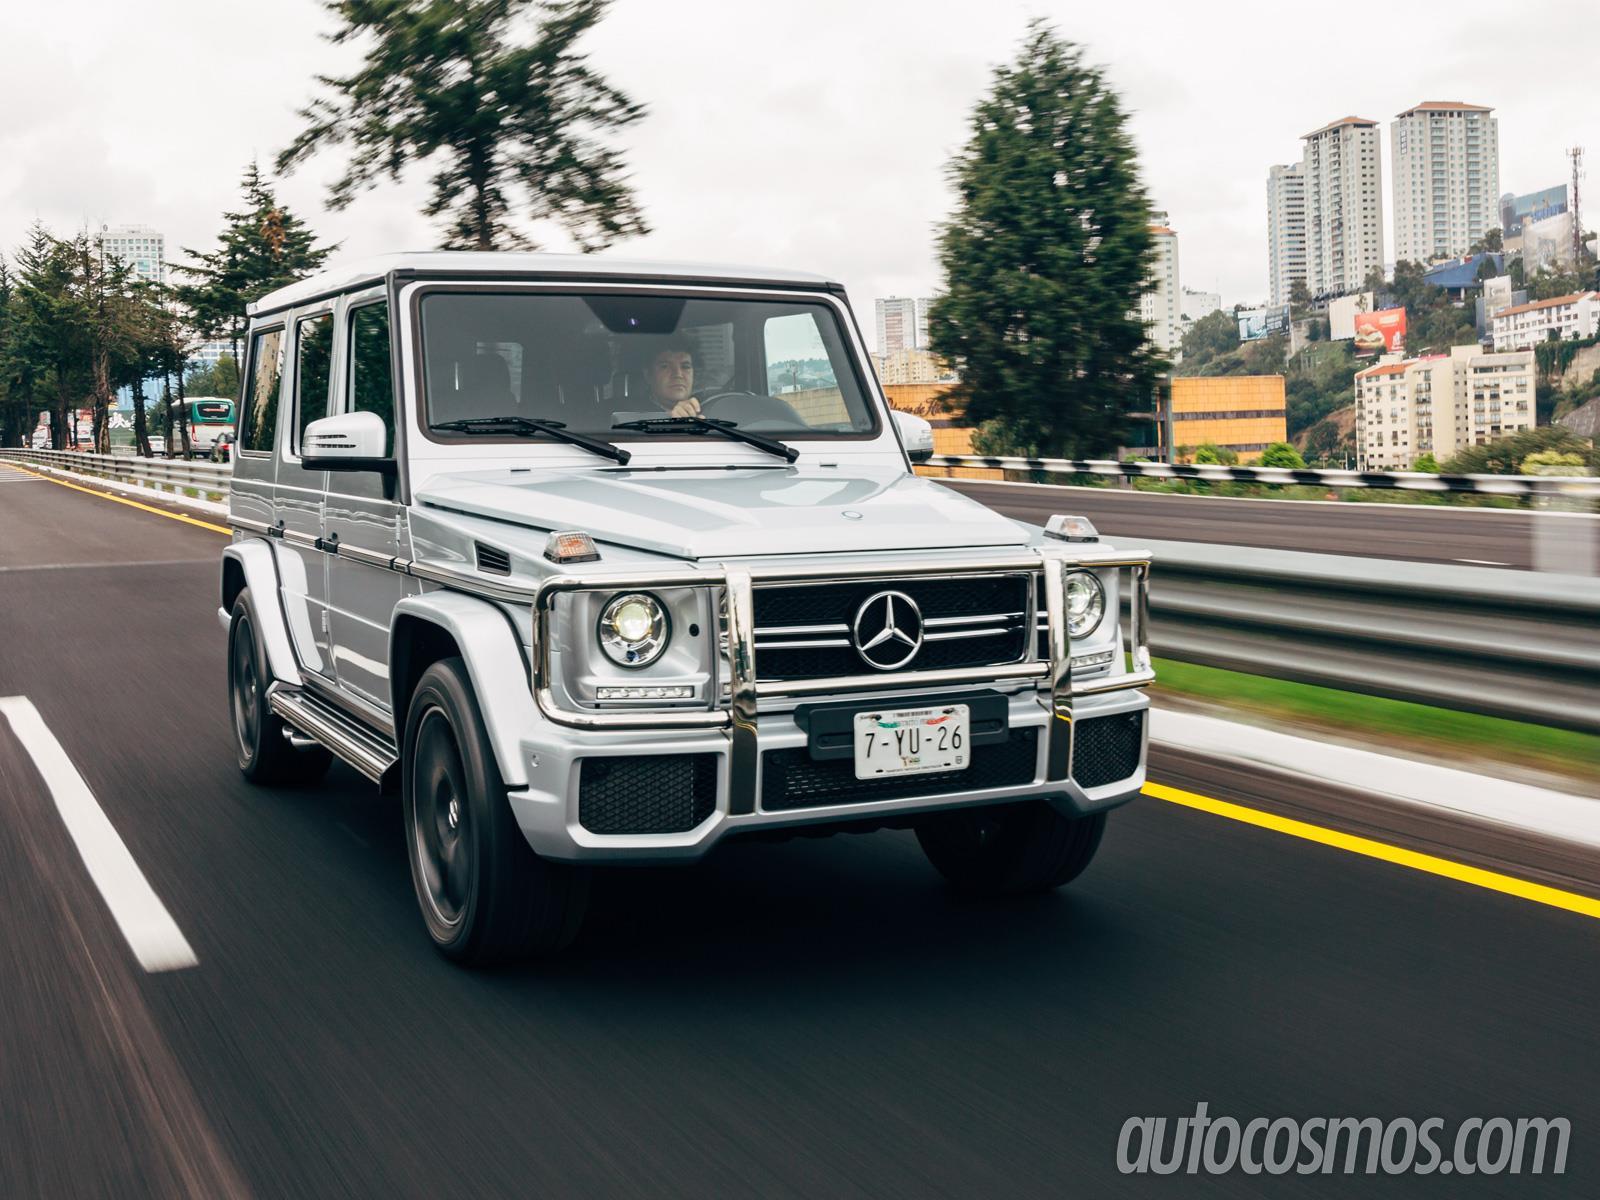 Test de mercedes benz g63 amg 2014 for Mercedes benz delaware